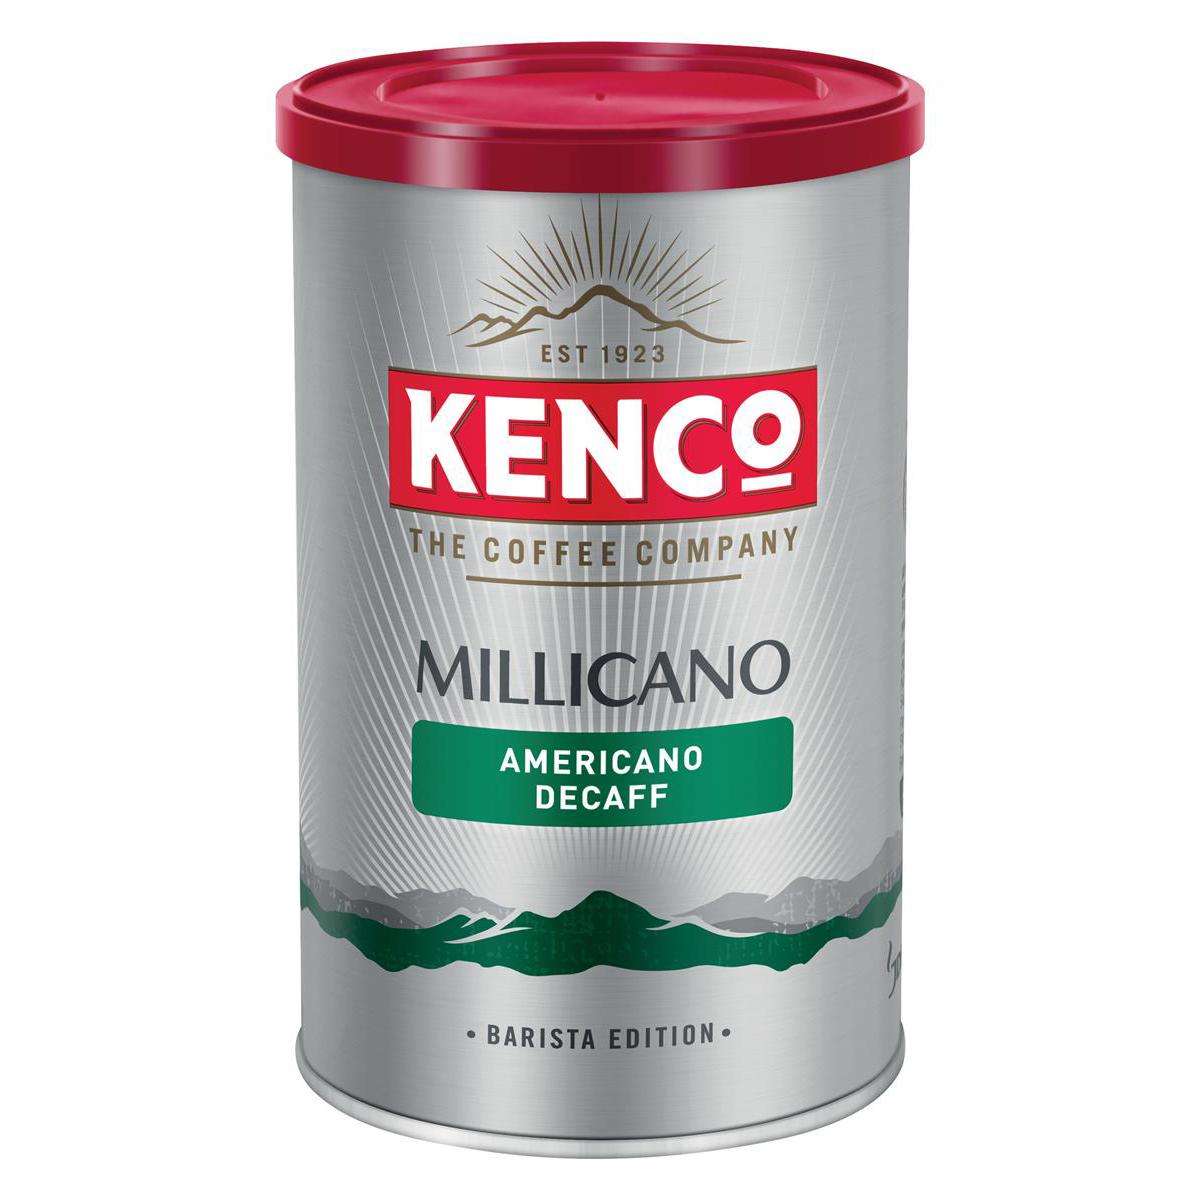 Kenco Millicano Coffee Wholebean Instant Caffeine Free [Decaff] 100g Ref 4032091